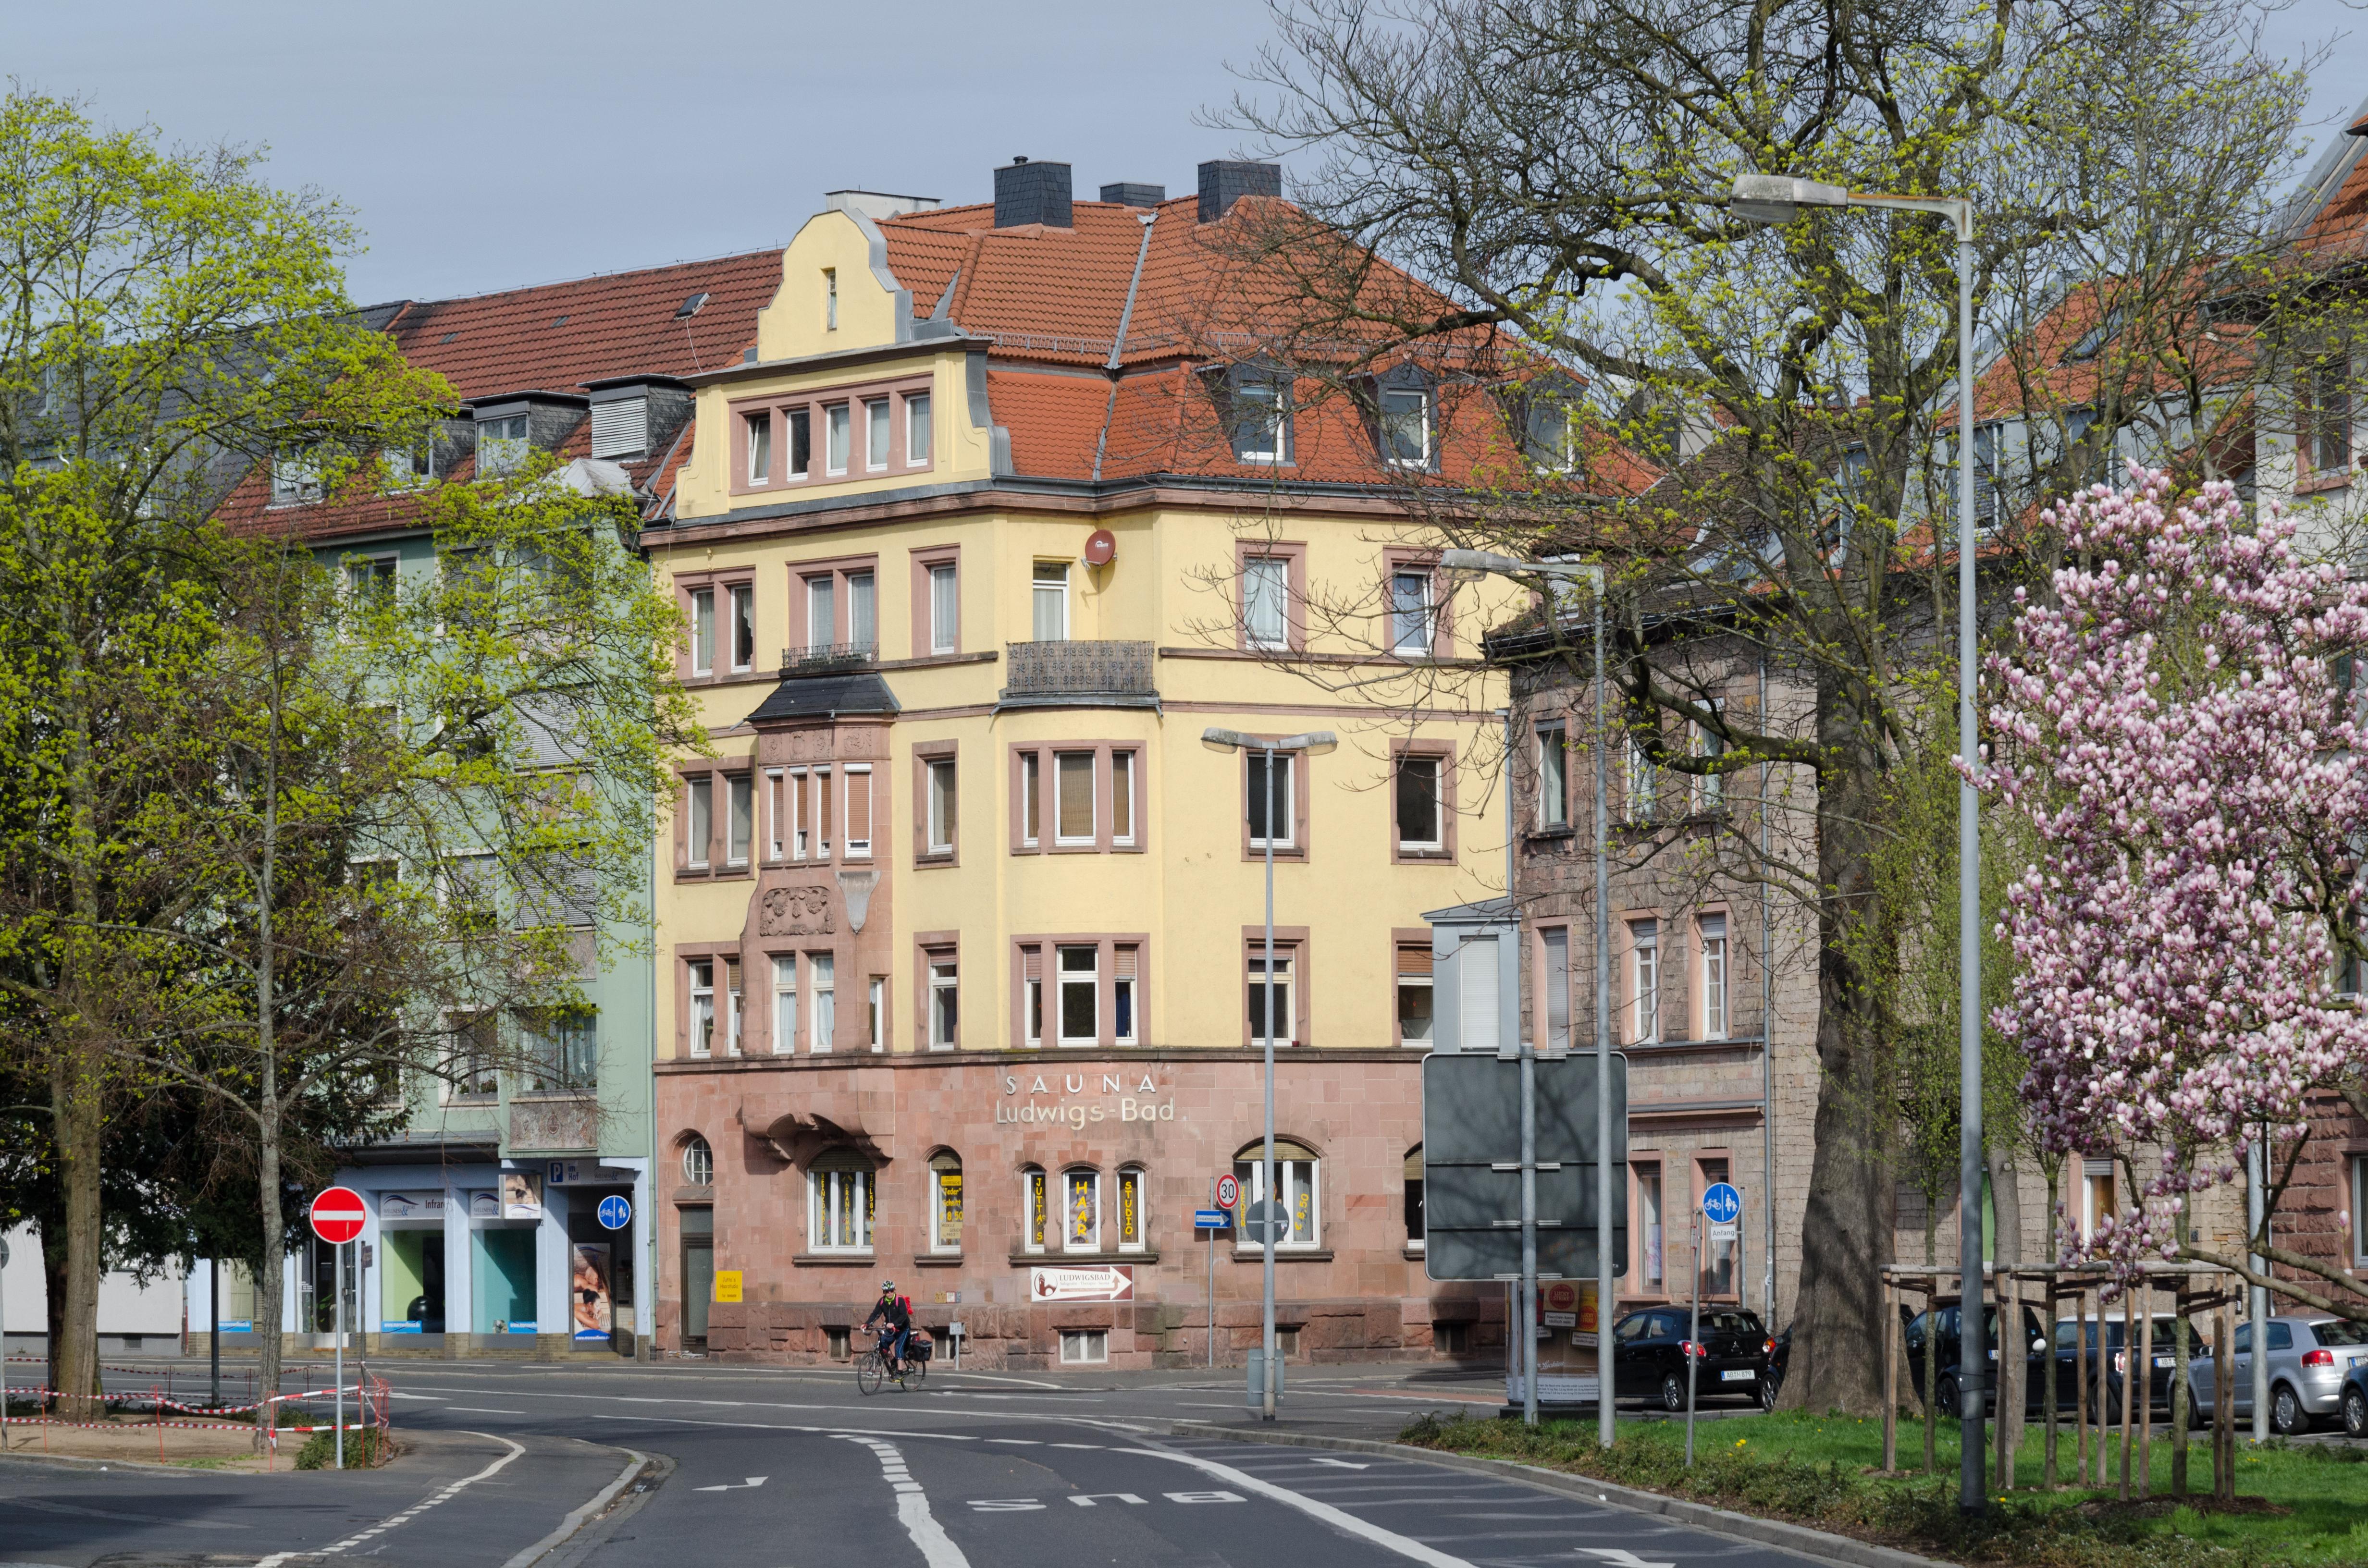 Wellness Aschaffenburg file:aschaffenburg, weißenburger straße 50-002 - wikimedia commons